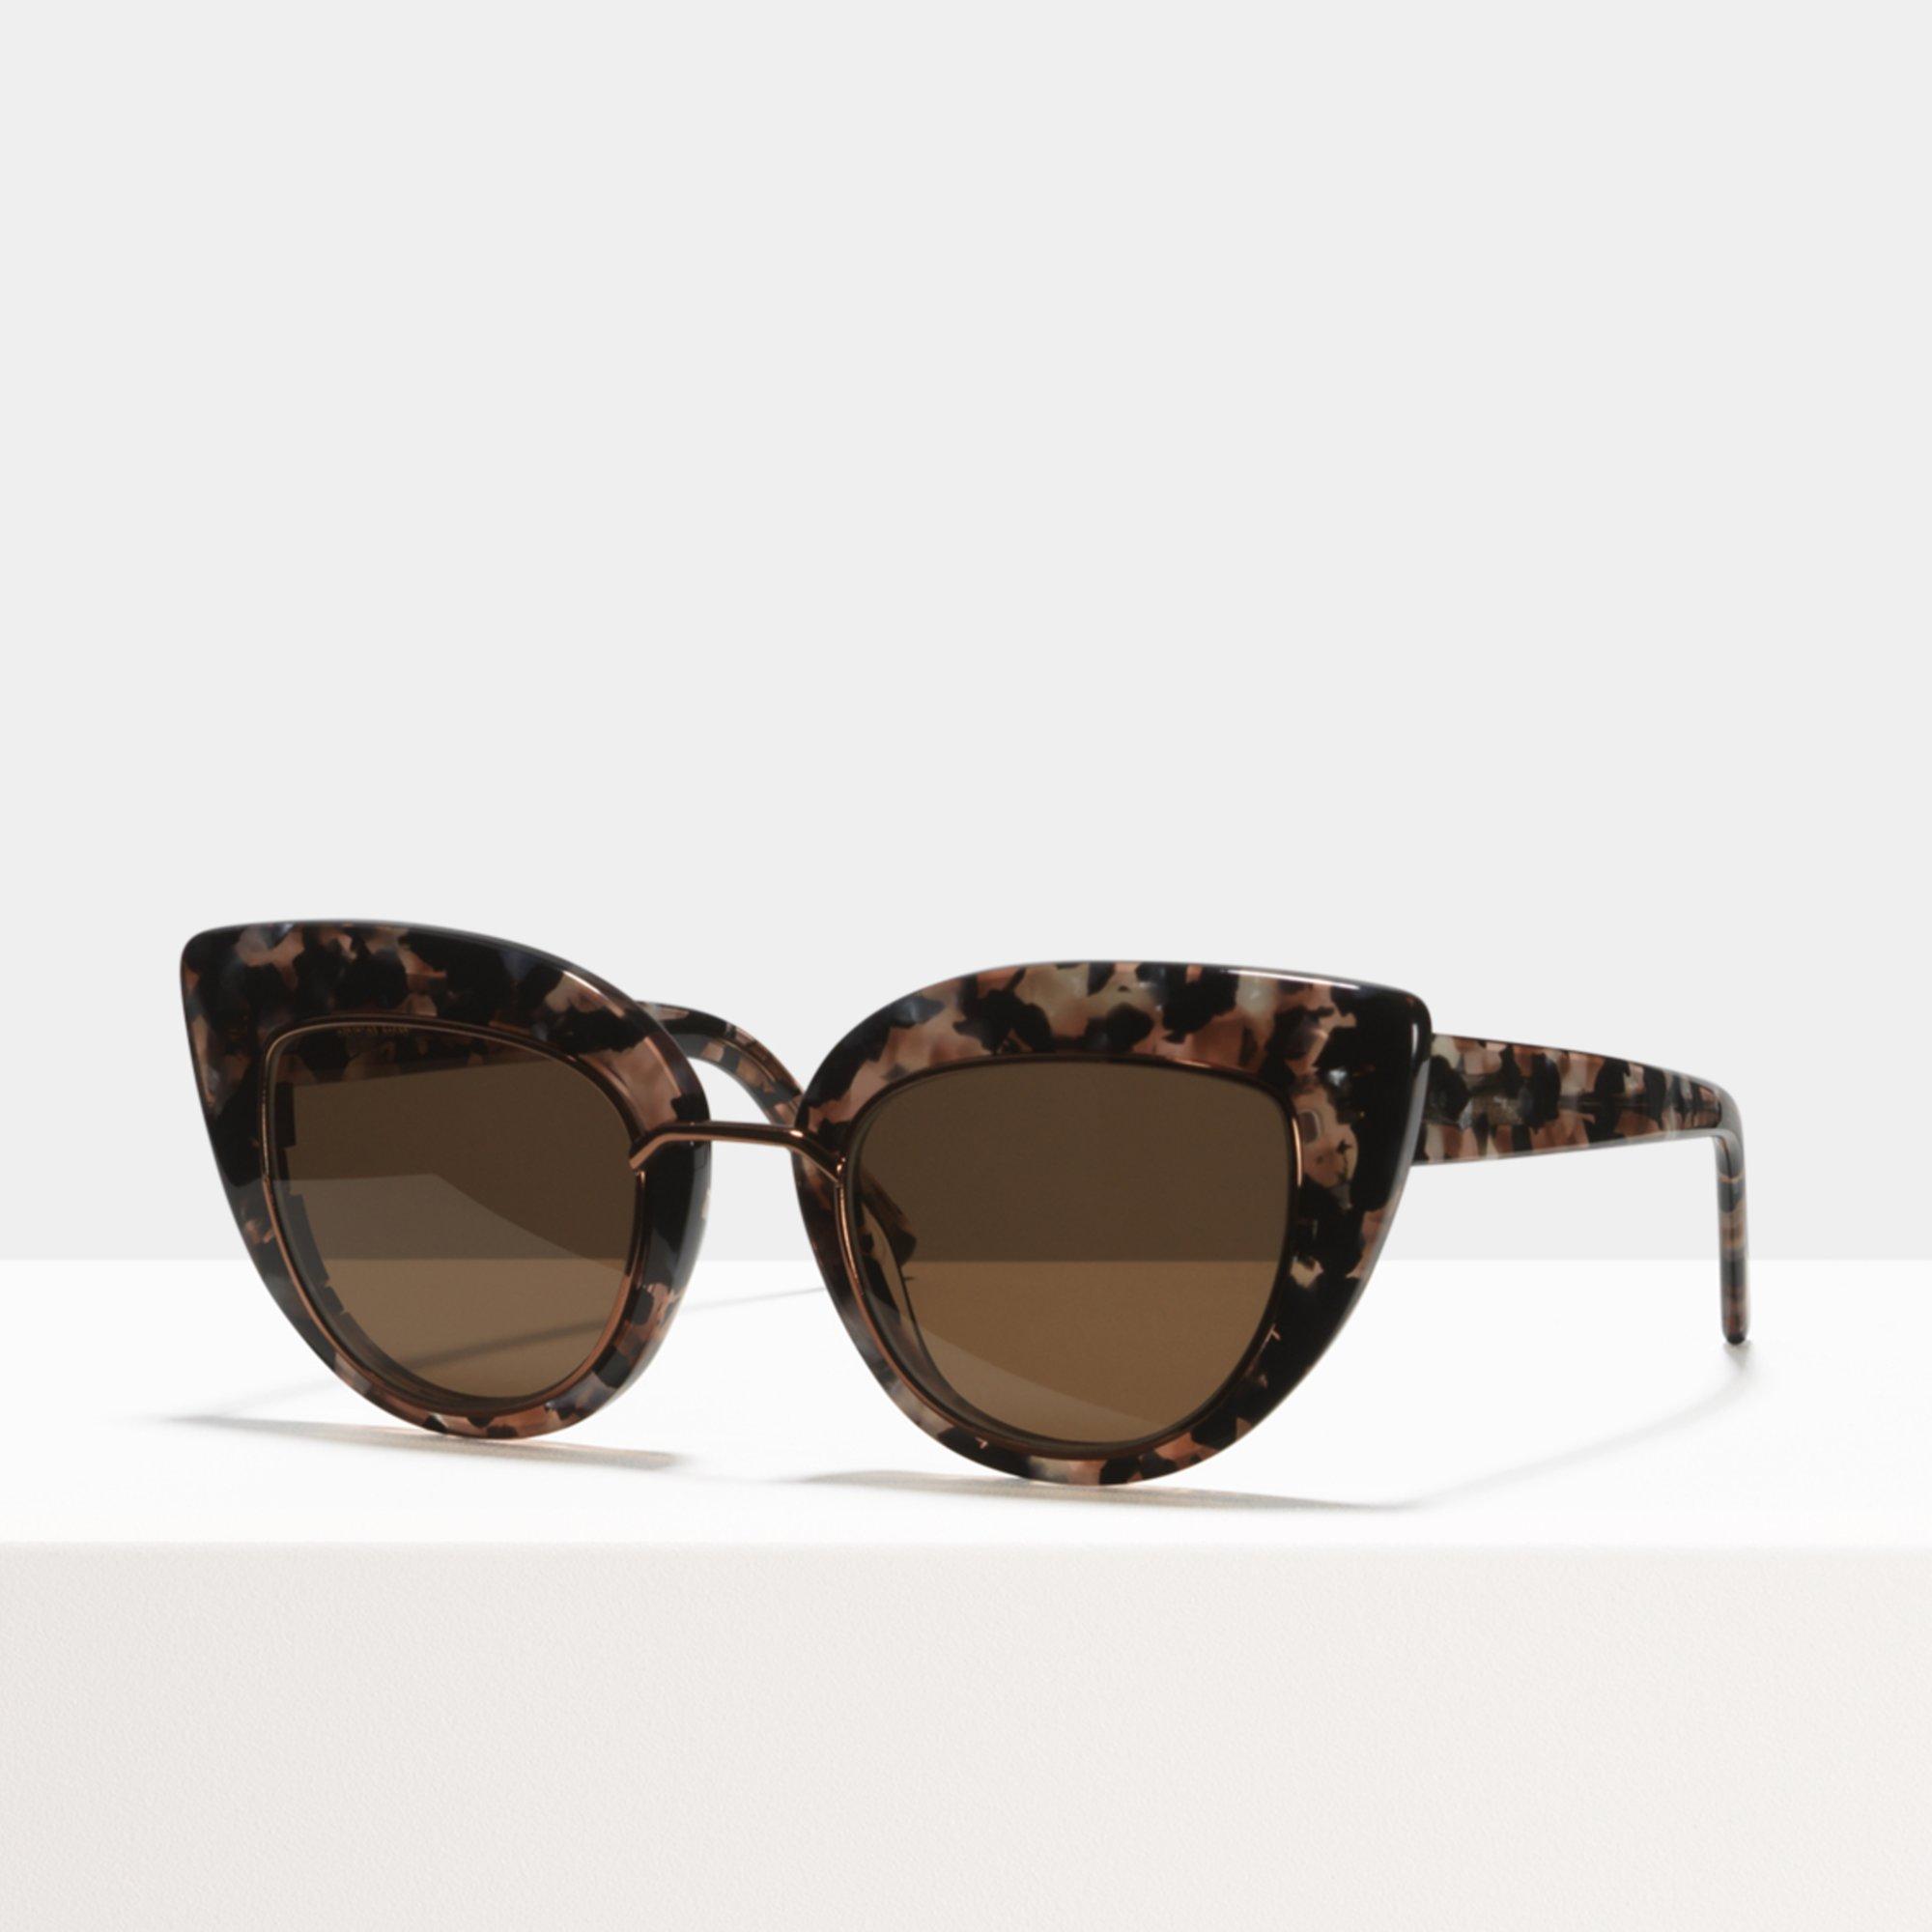 Ace & Tate Sunglasses |  acetate in Beige, Brown, Green, Pink